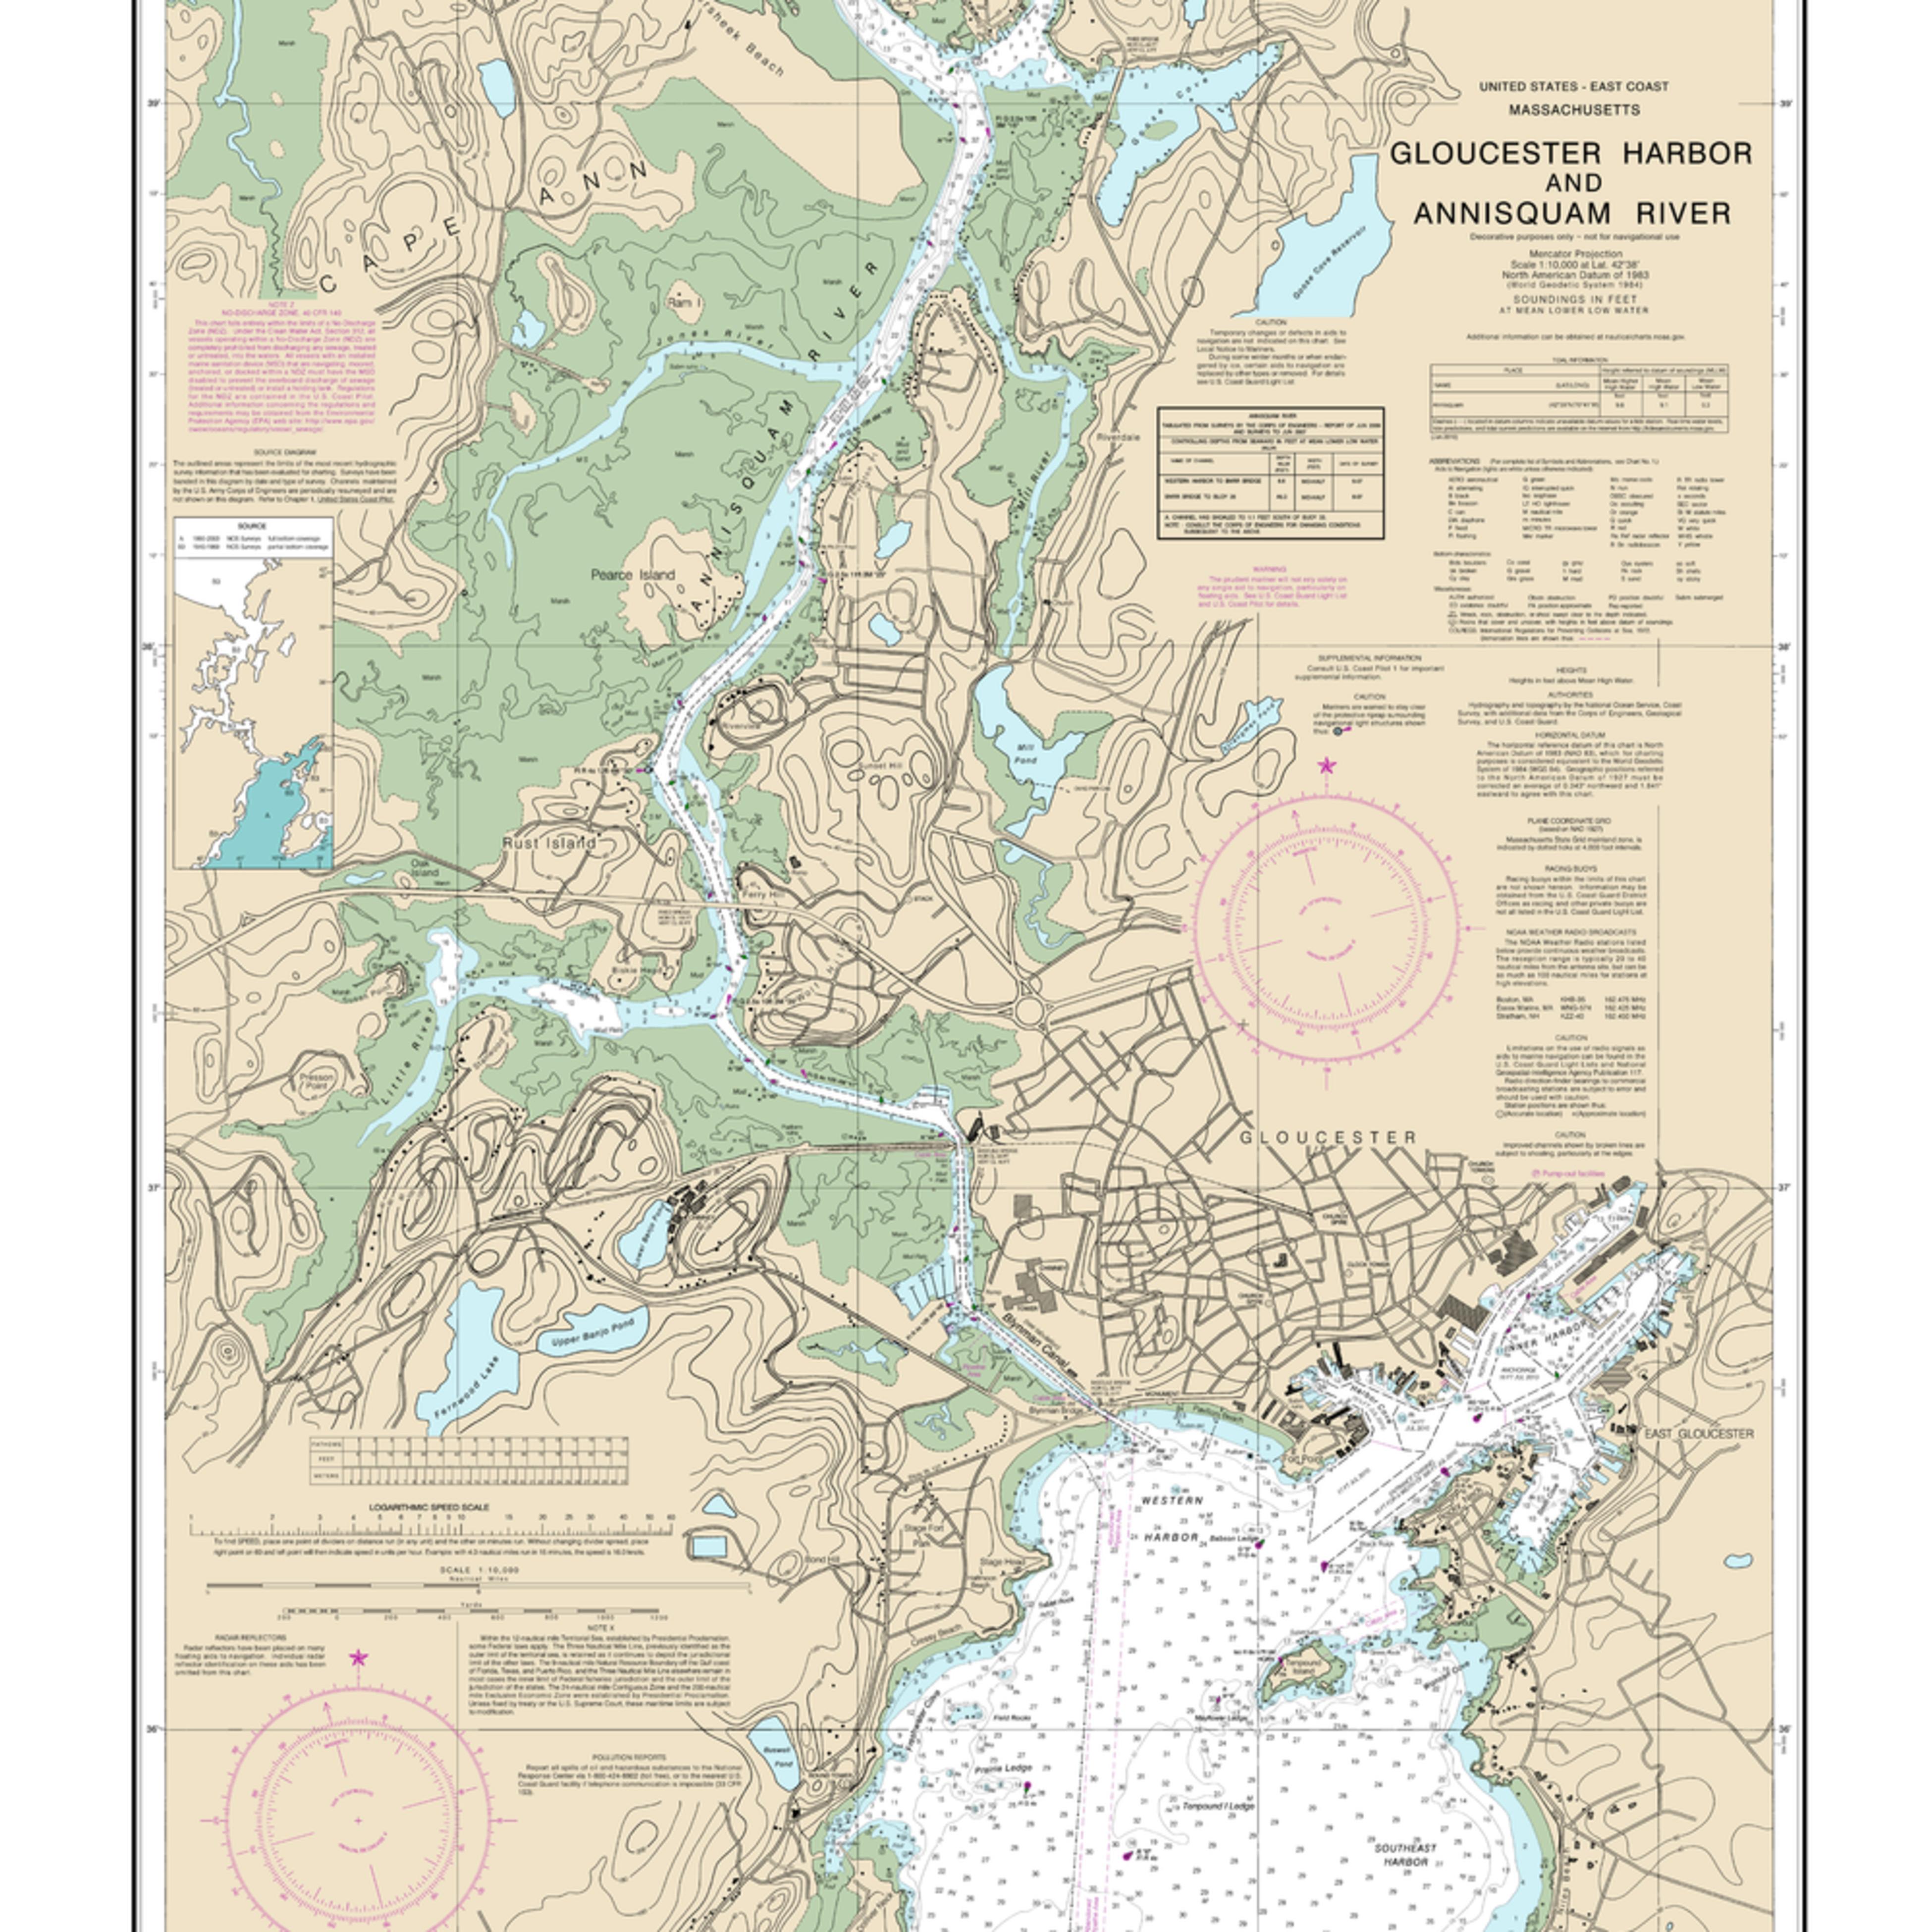 Nauticalmap 13281 gloucesterharbor anisquamriver j32e1a